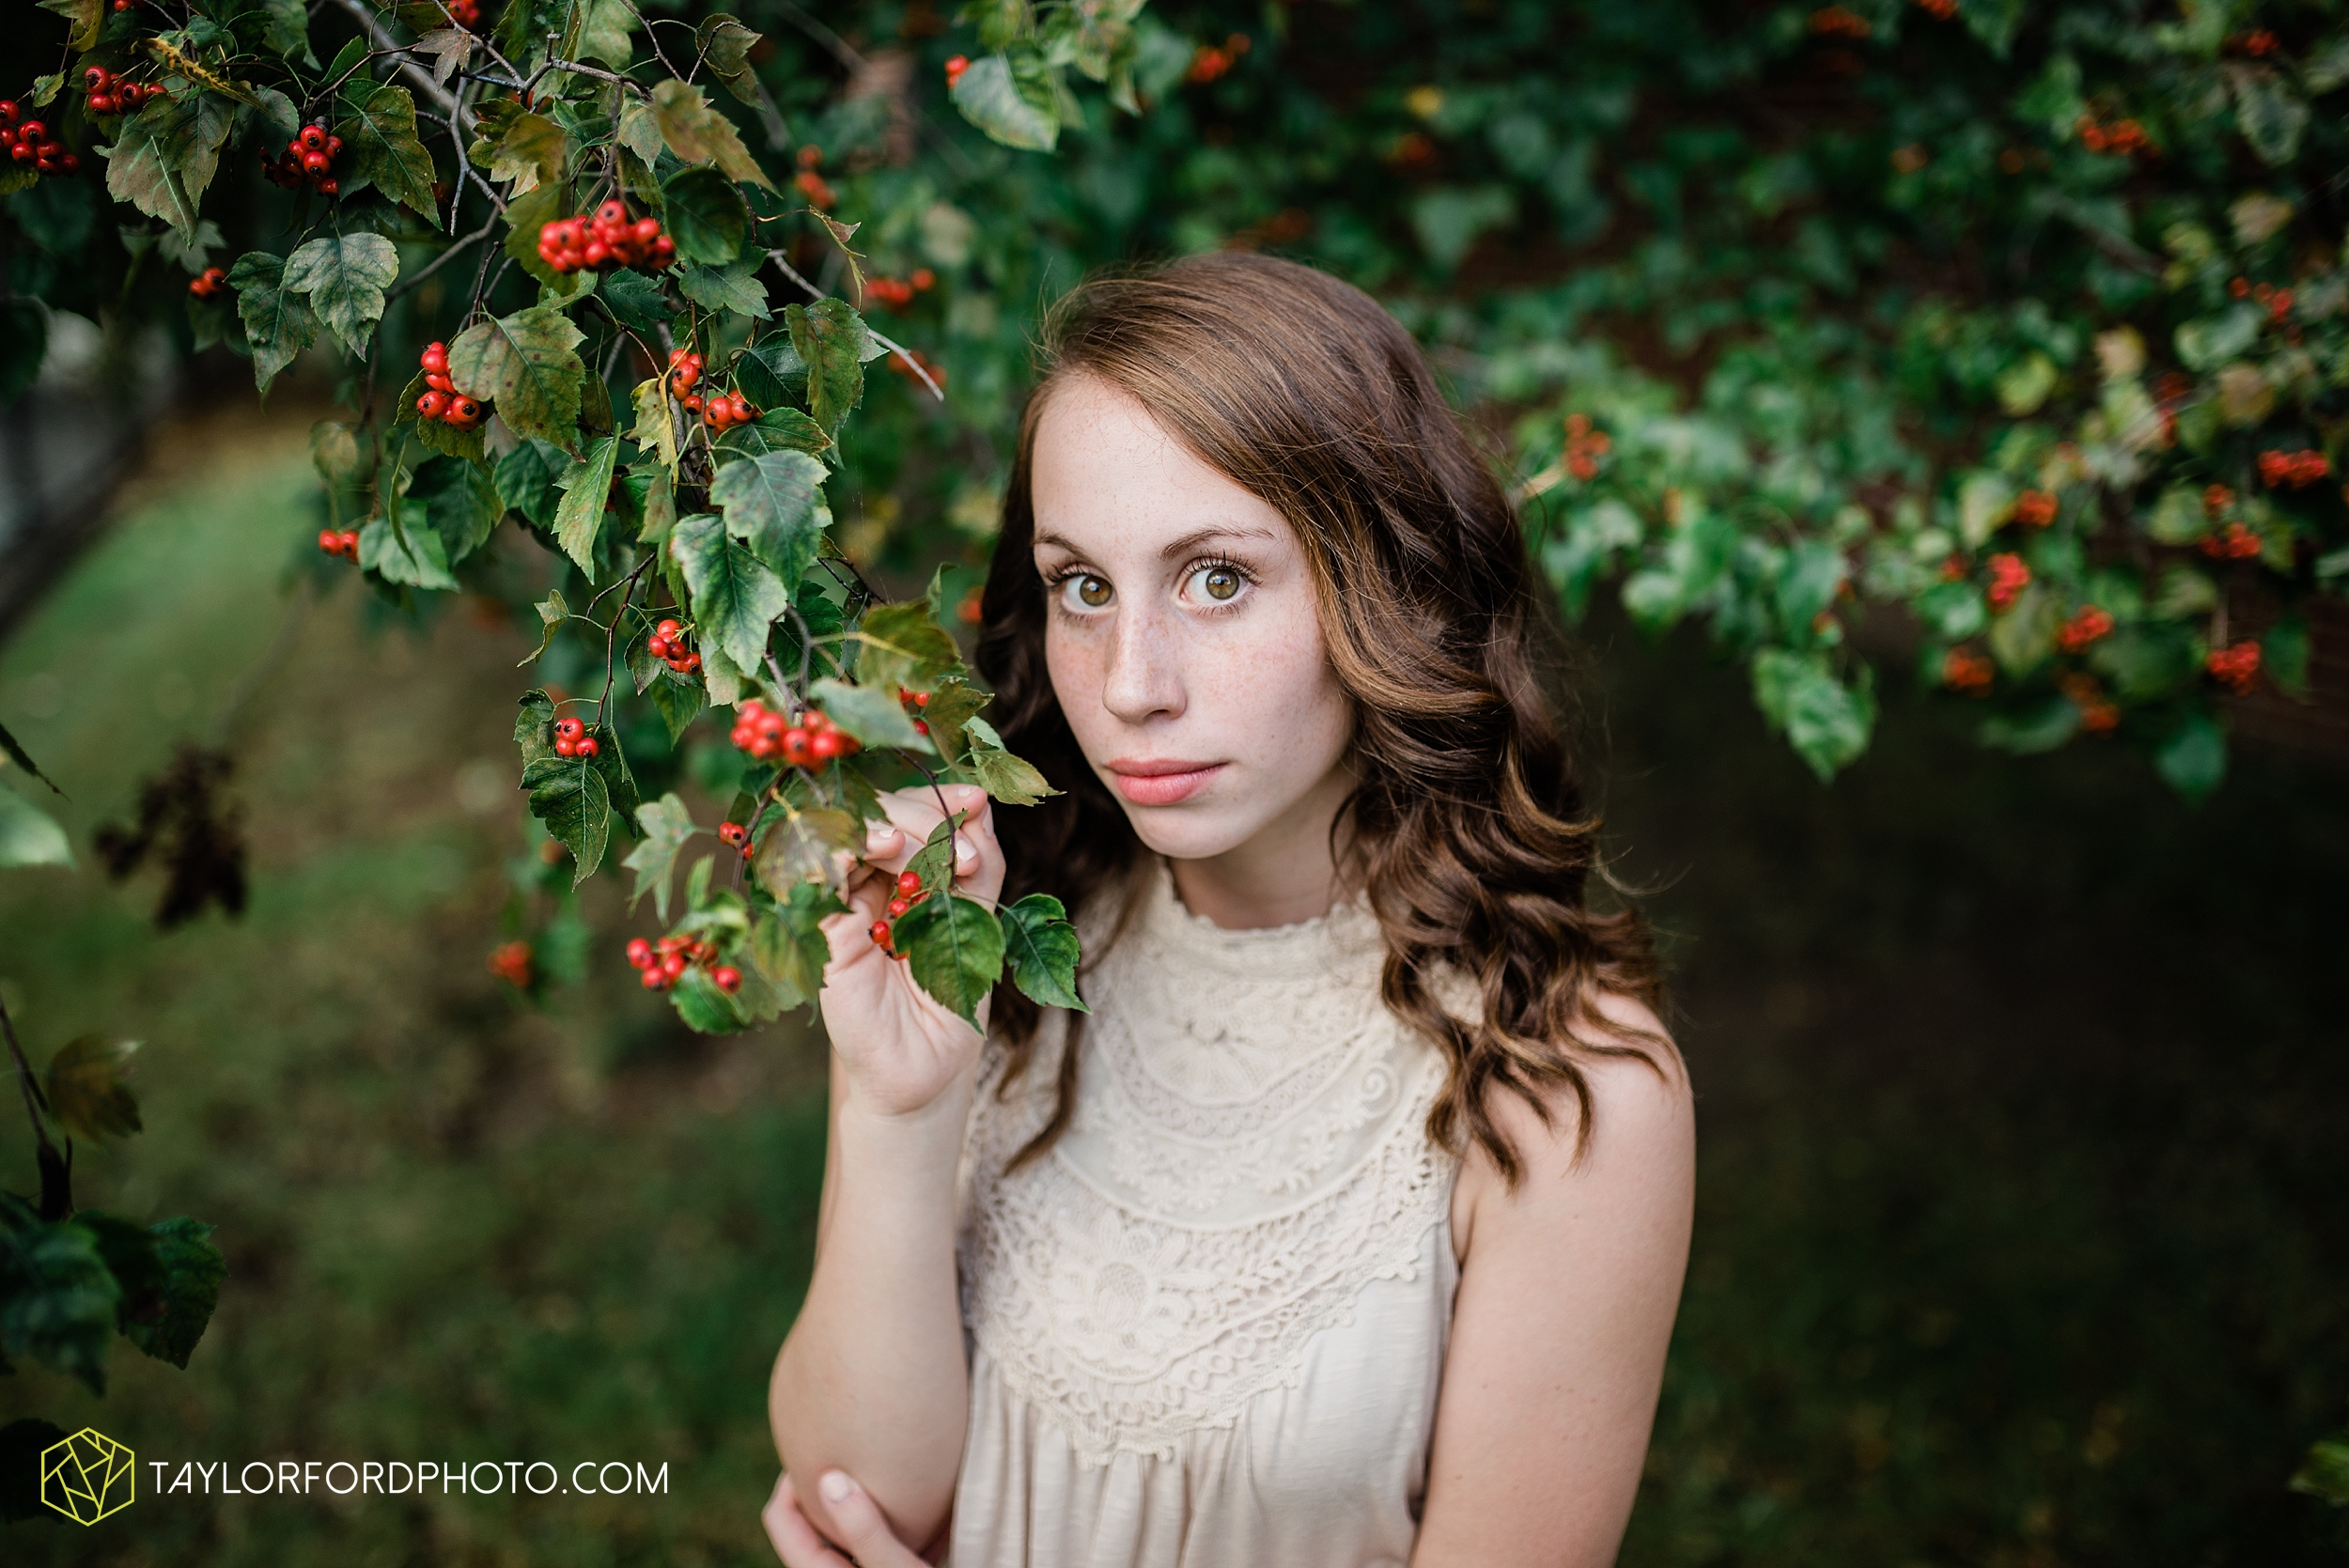 van-wert-high-school-ohio-senior-girl-downtown-cougar-photographer-taylor-ford-photography_0930.jpg